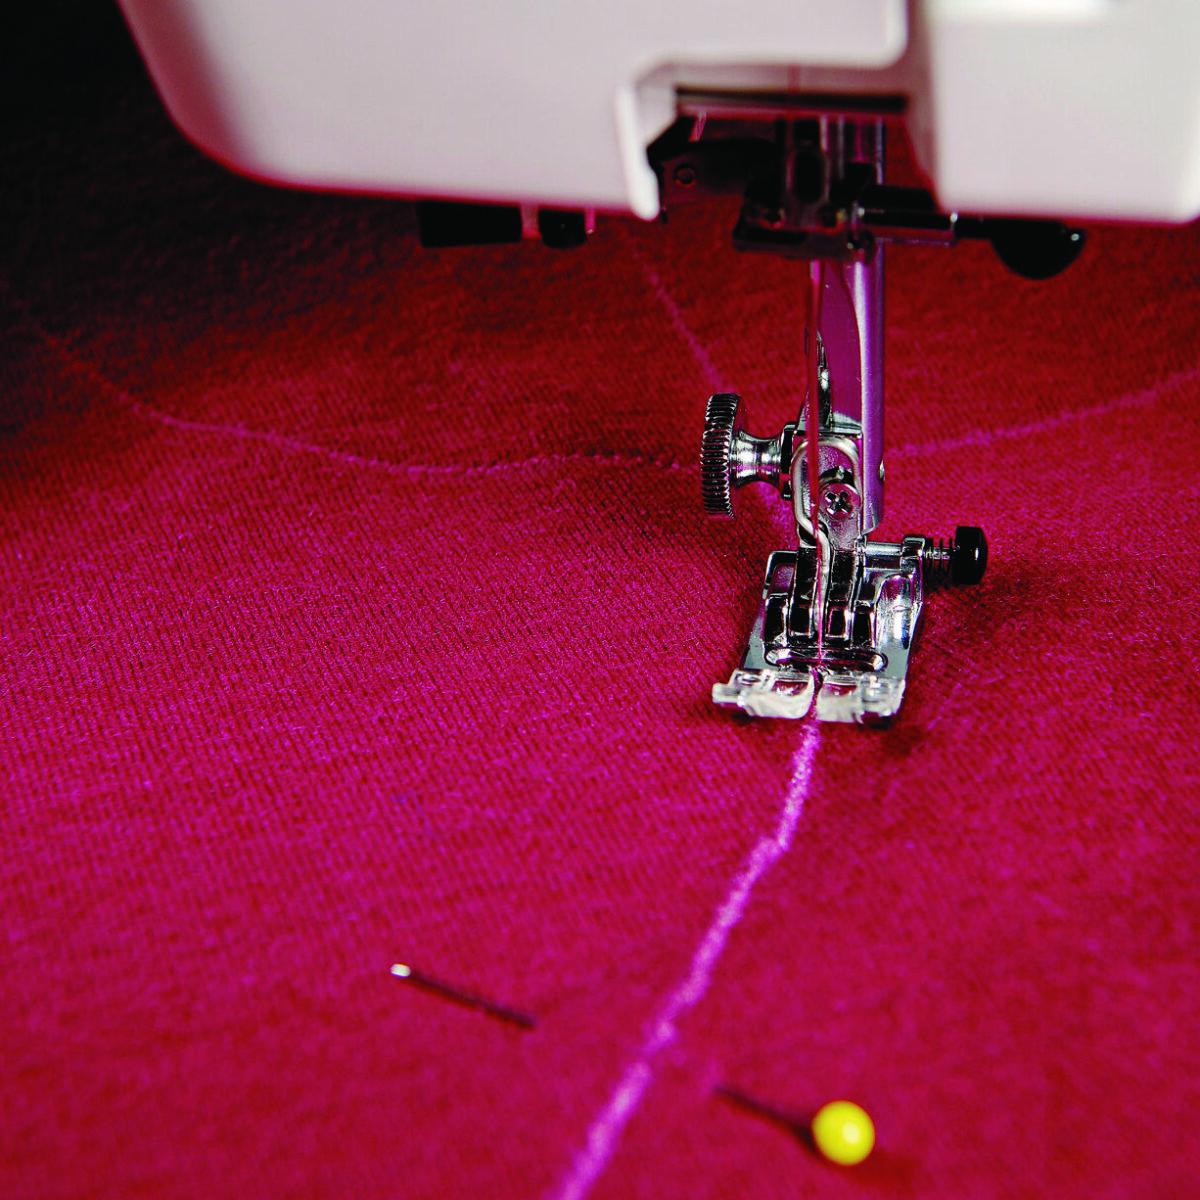 Stitch the design